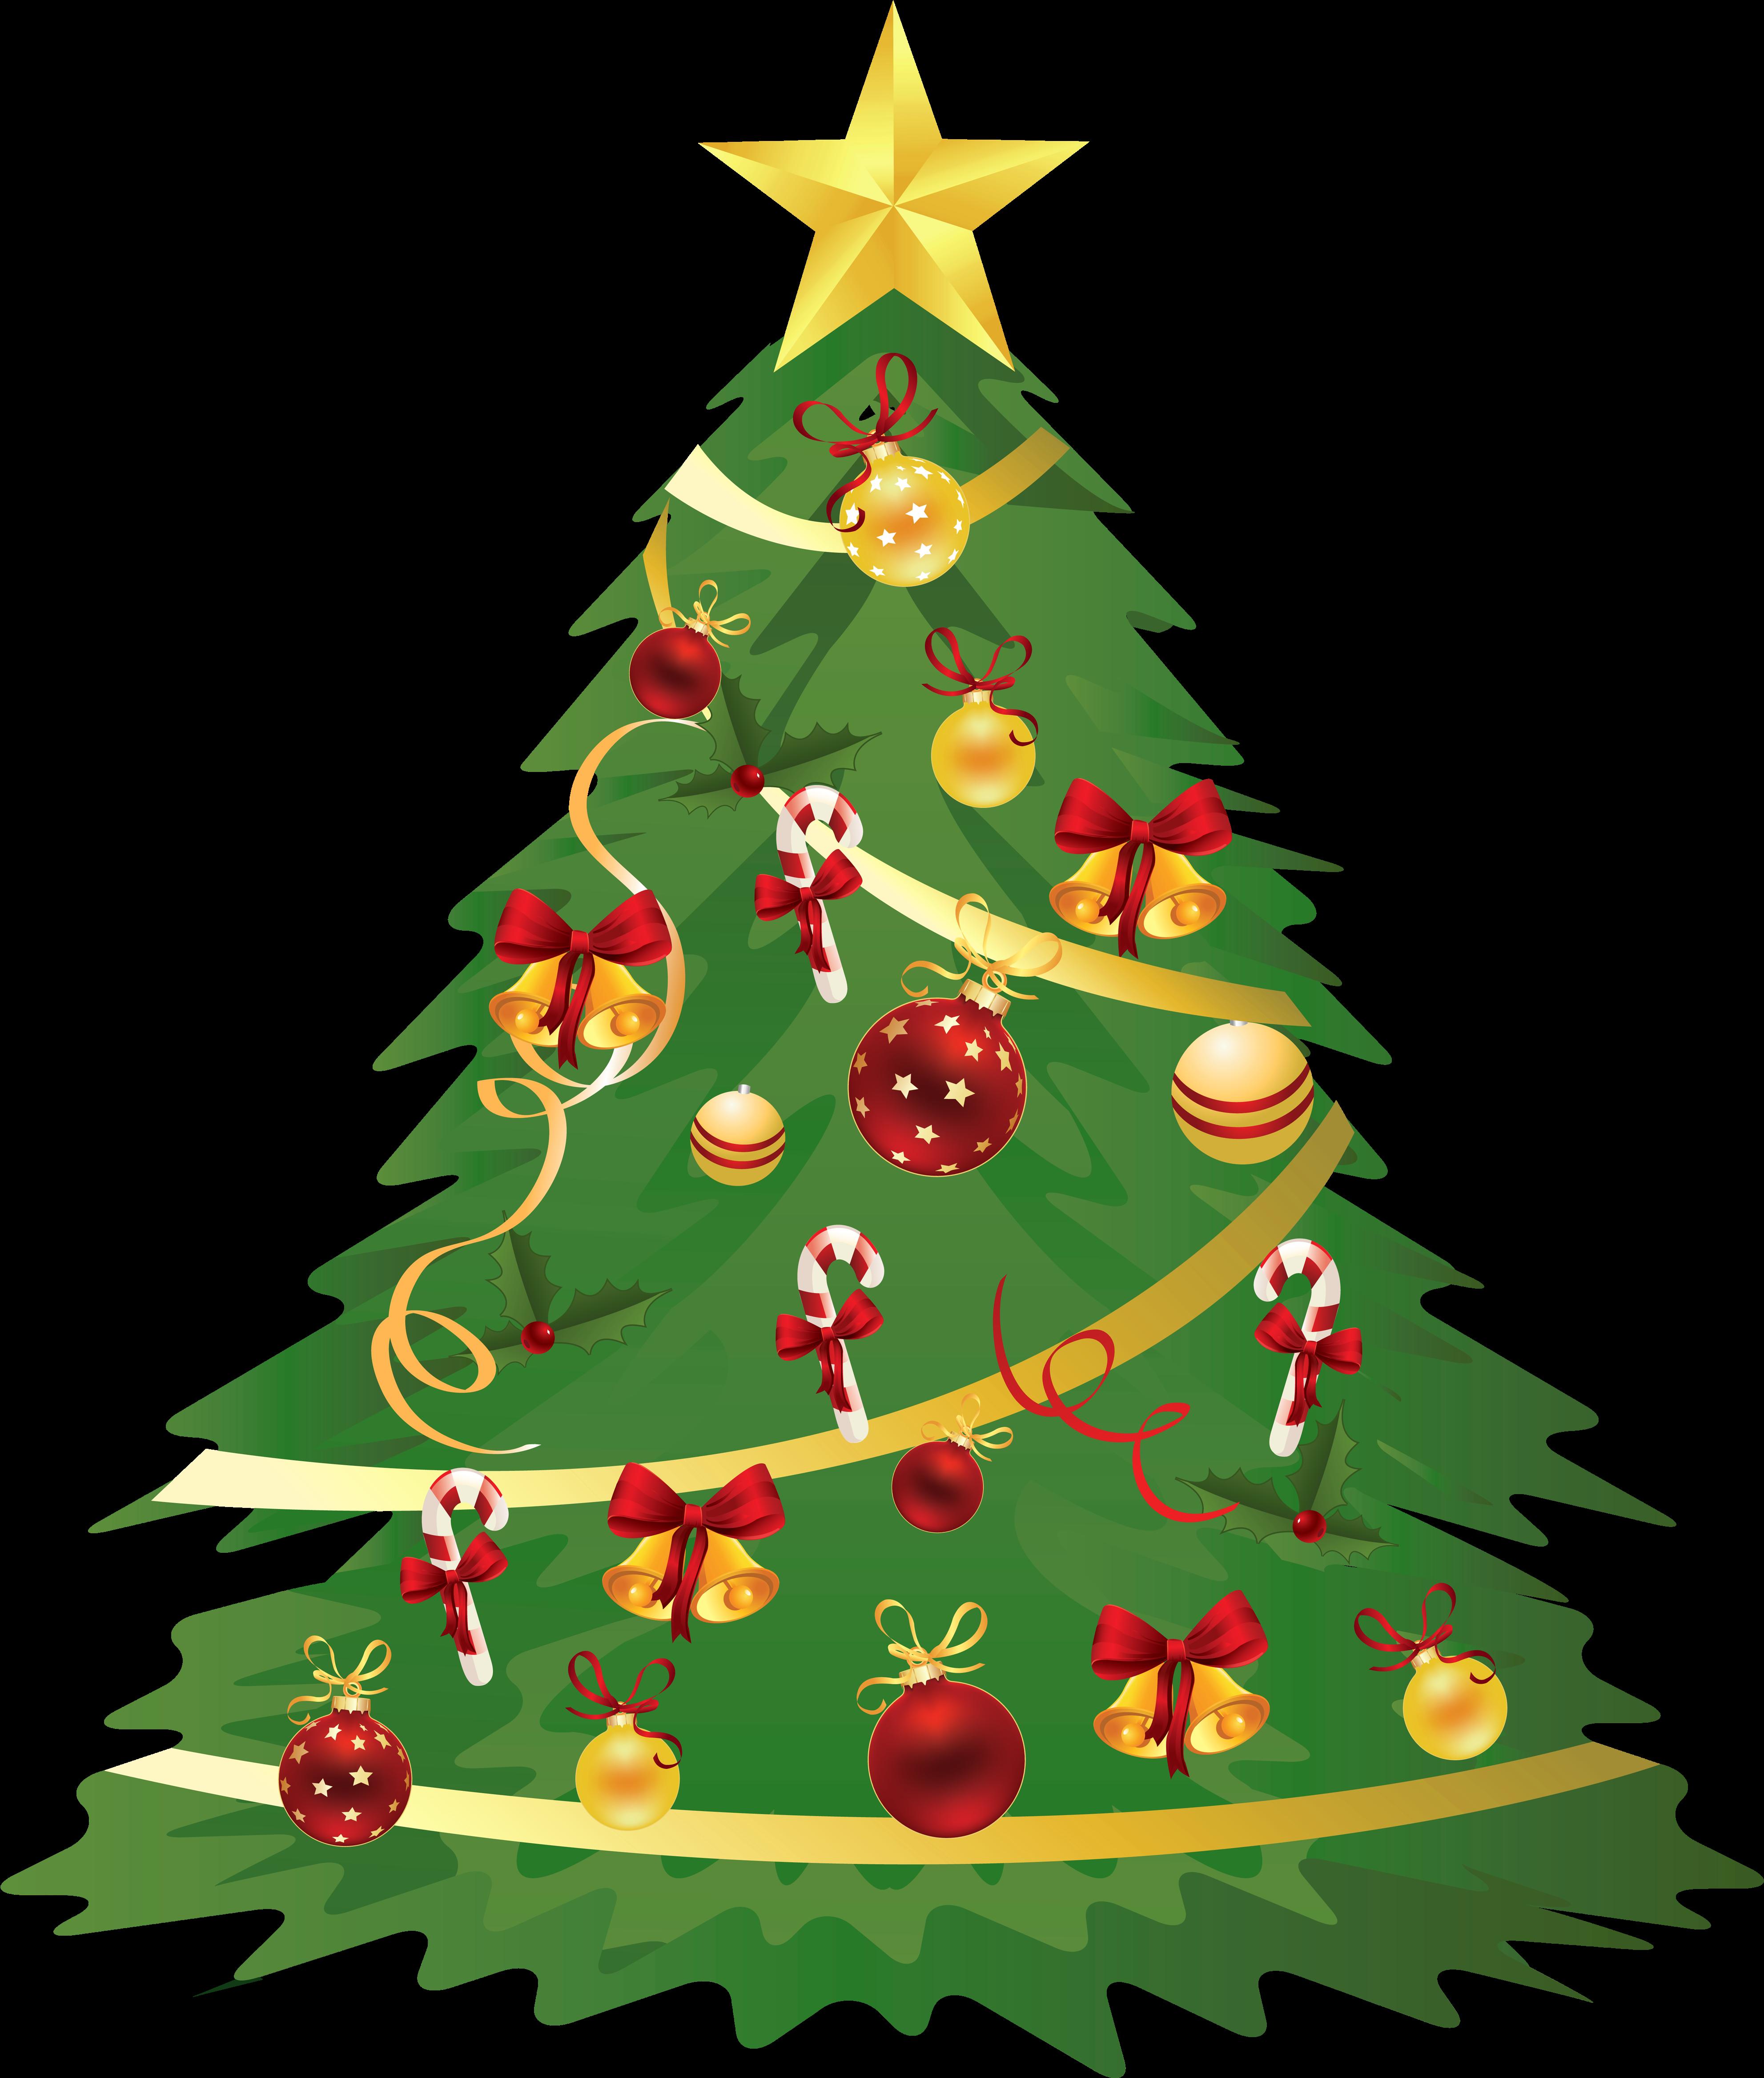 Christmas Clipart No Background.Tree Christmas Christmas Tree Clipart Transparent